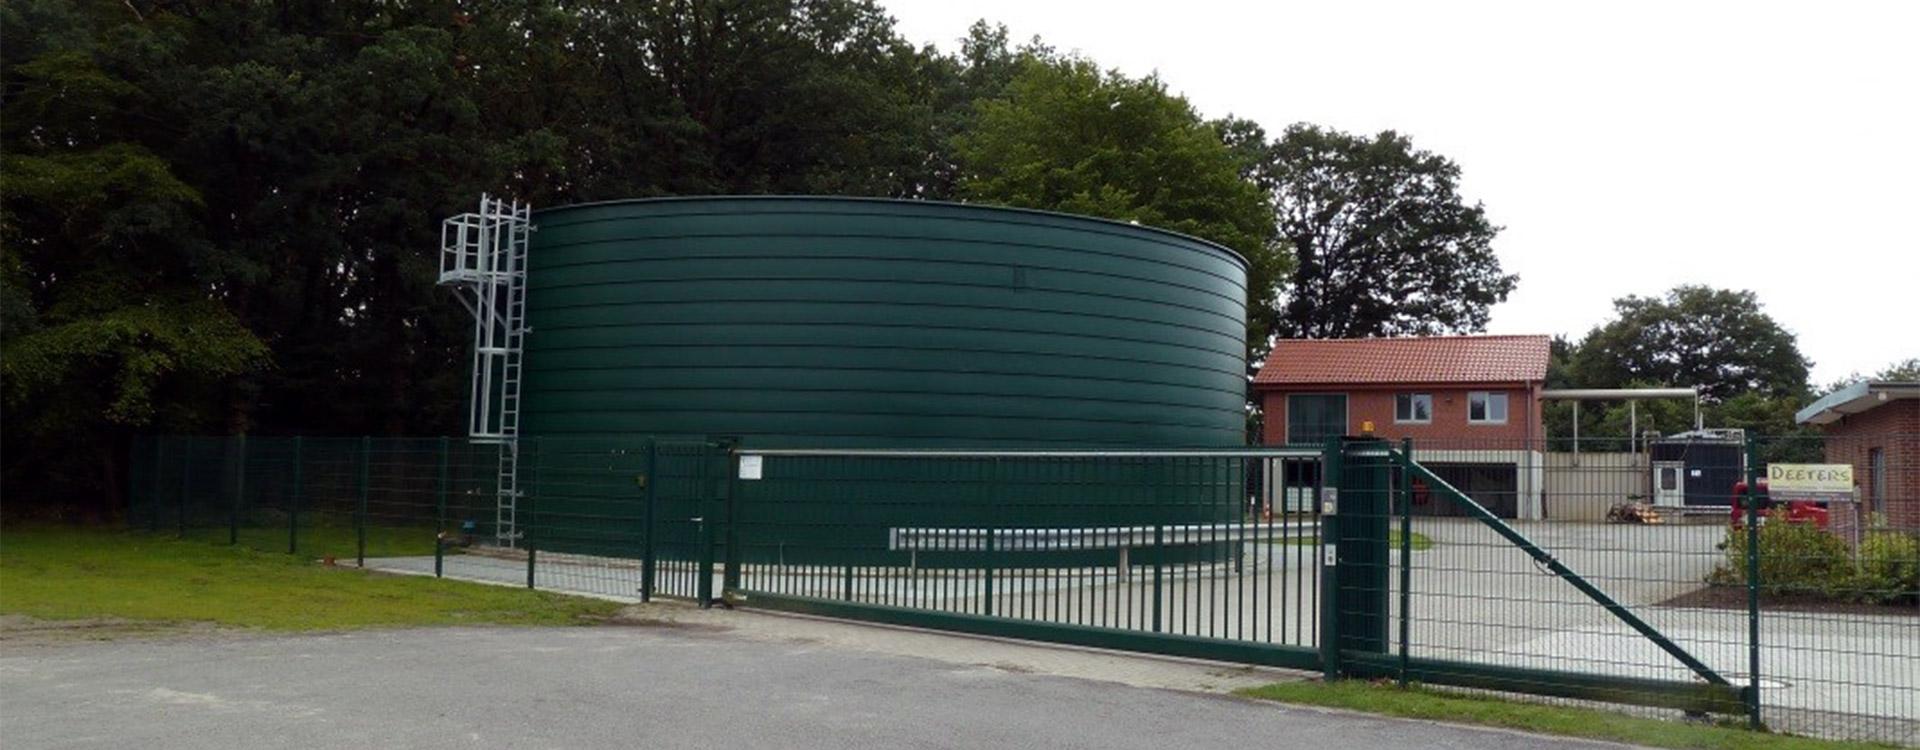 Waste Water Tank - Lipp System